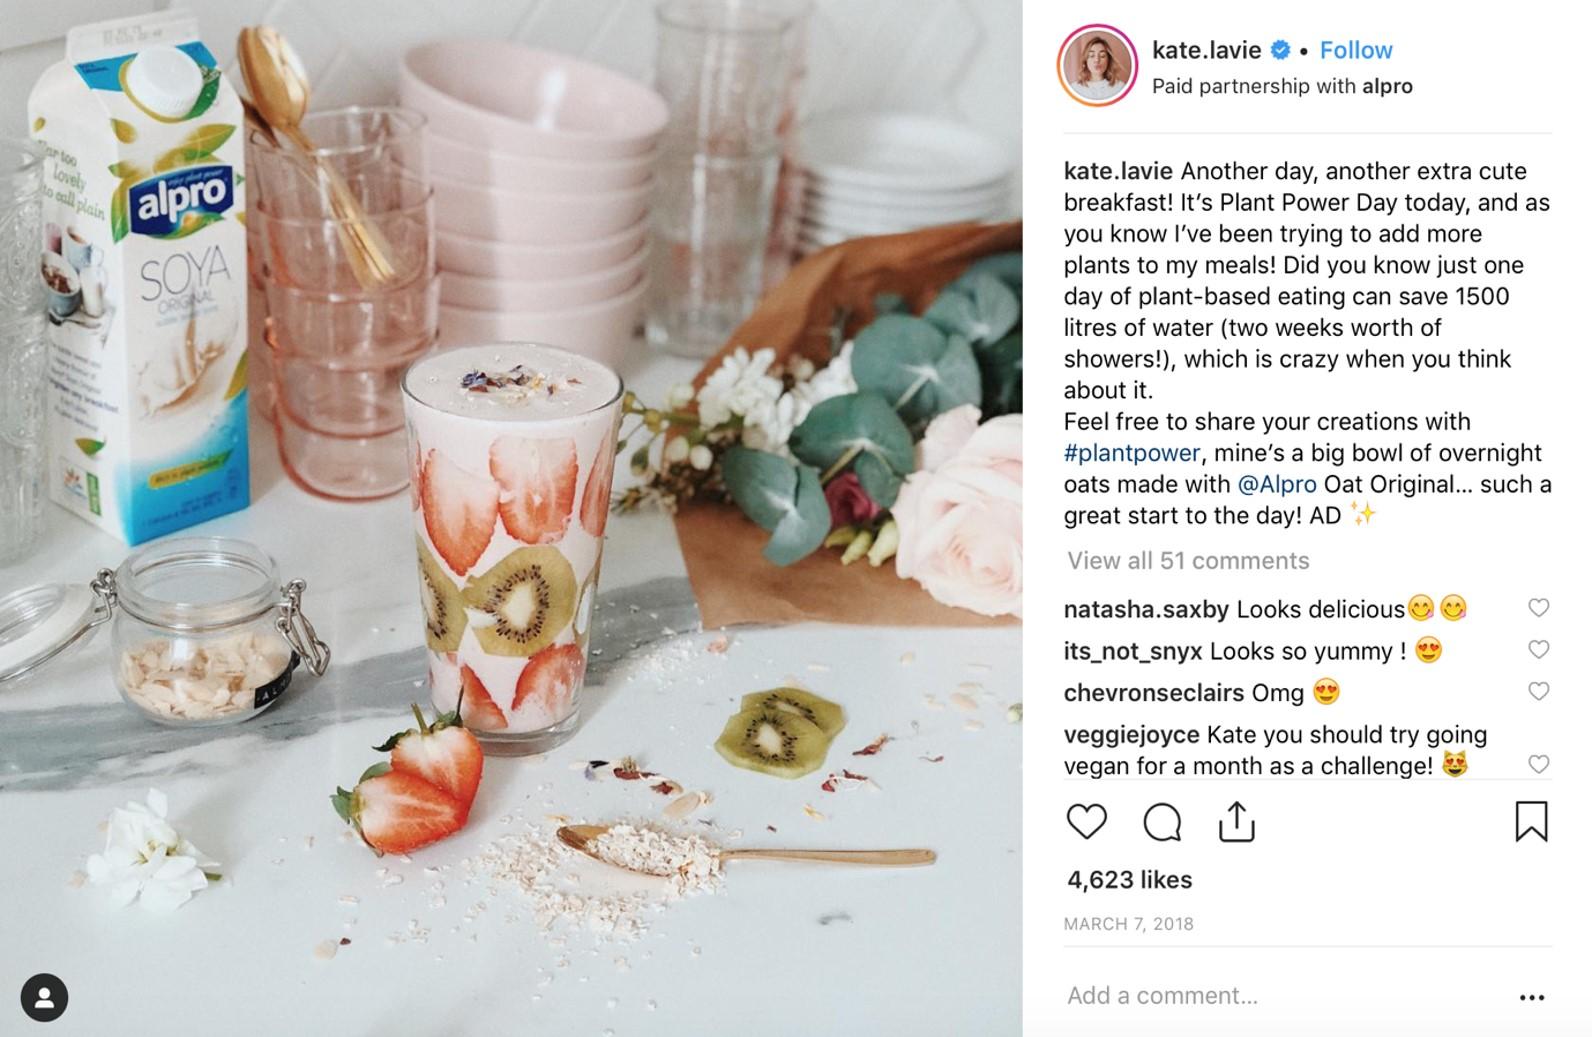 screenshot of influencer post on Instagram